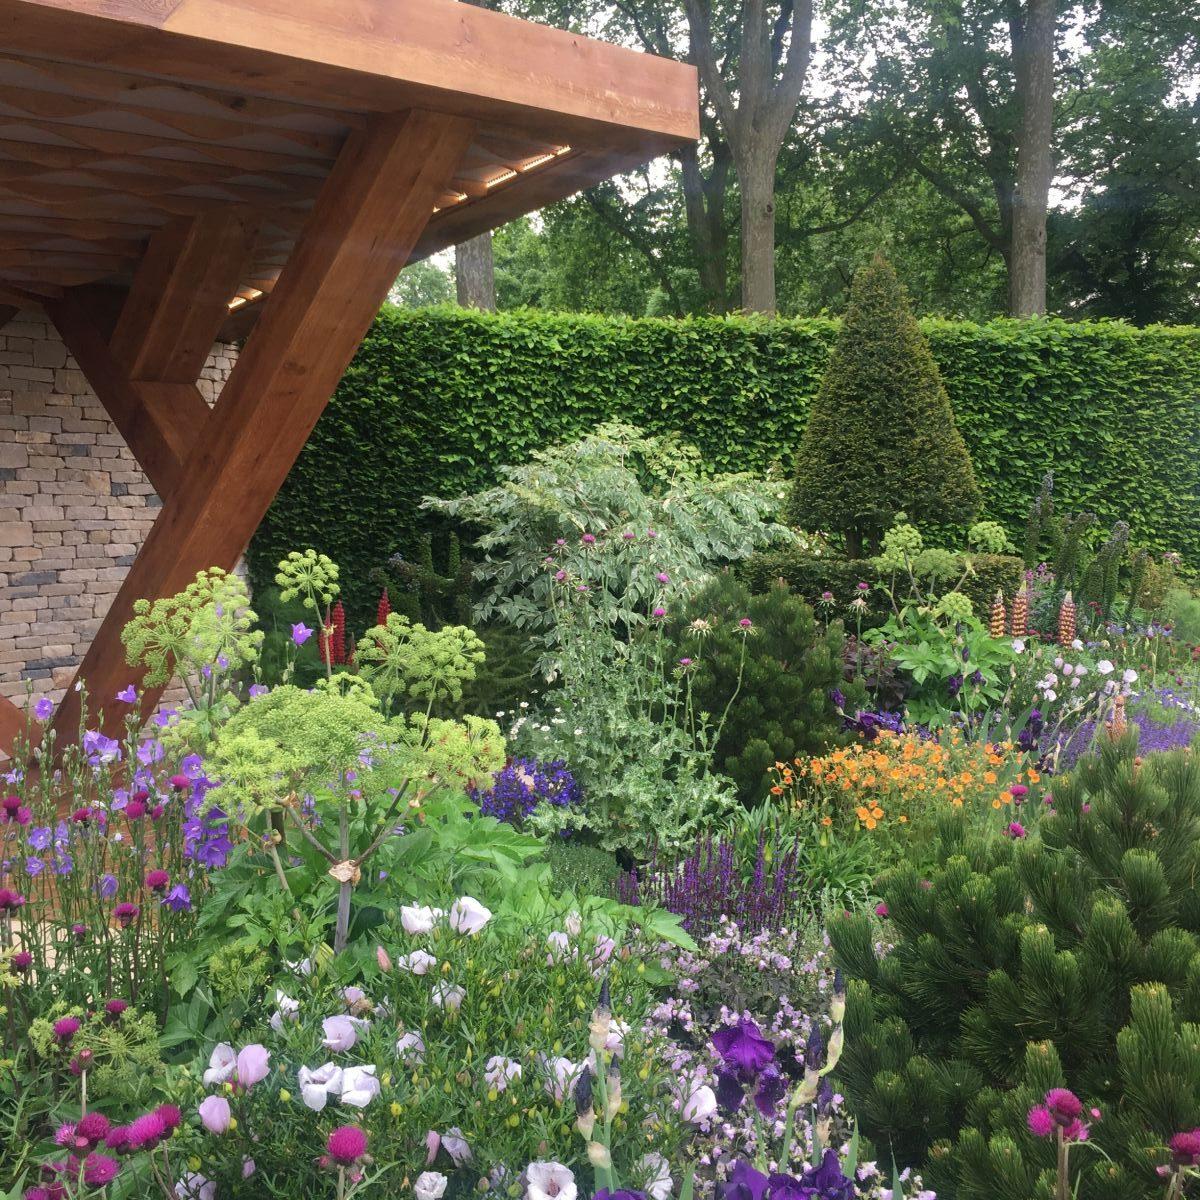 Rhs chelsea flower show 2017 jack wallington garden for Chelsea 2017 show gardens